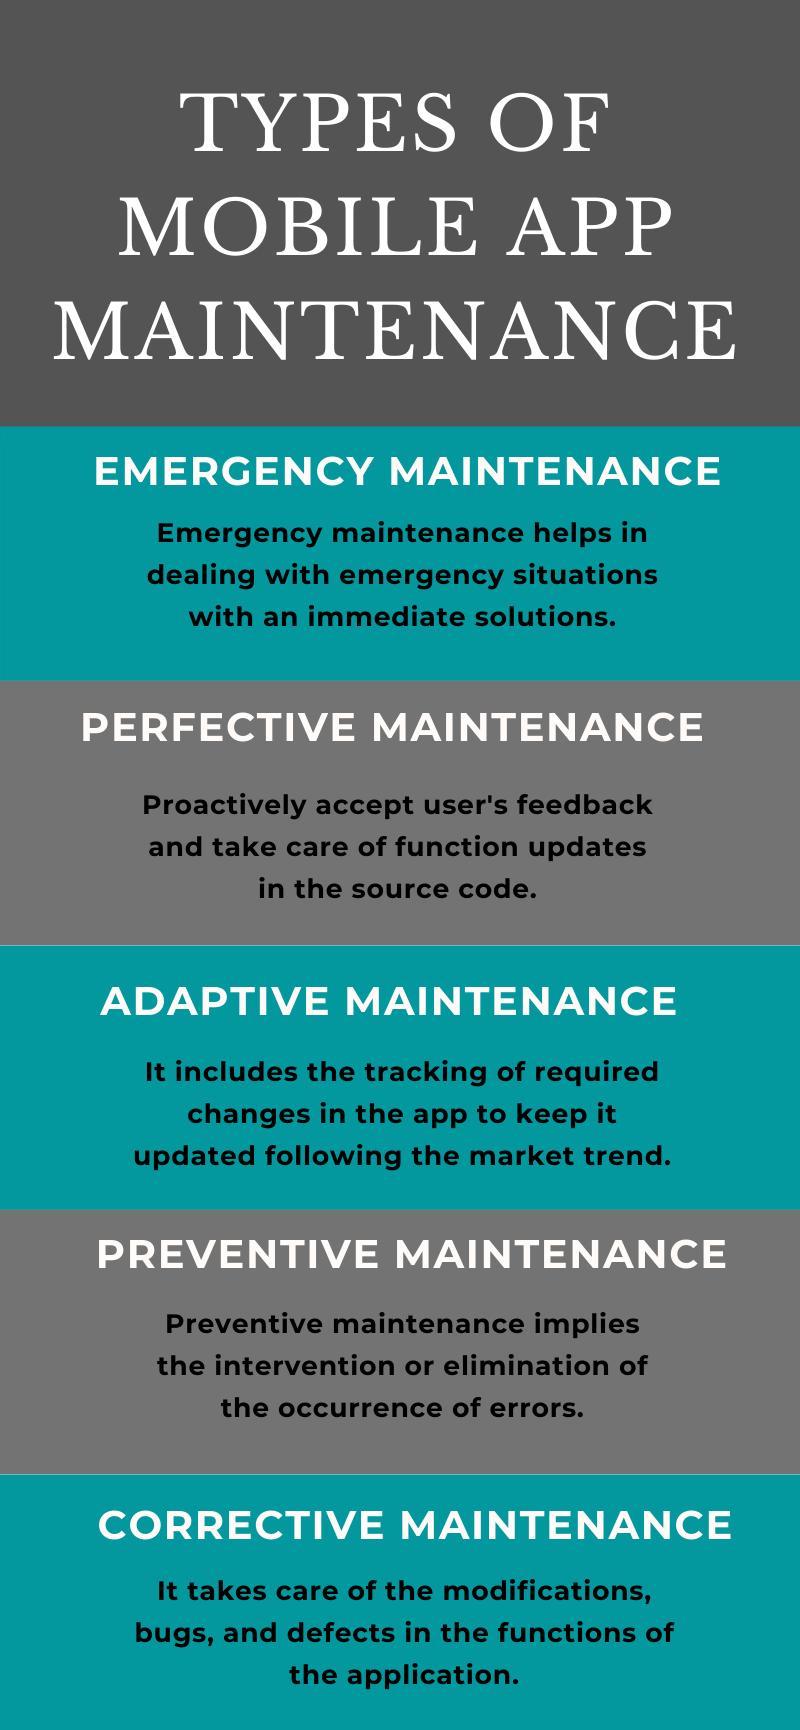 Types of mobile app-maintenance